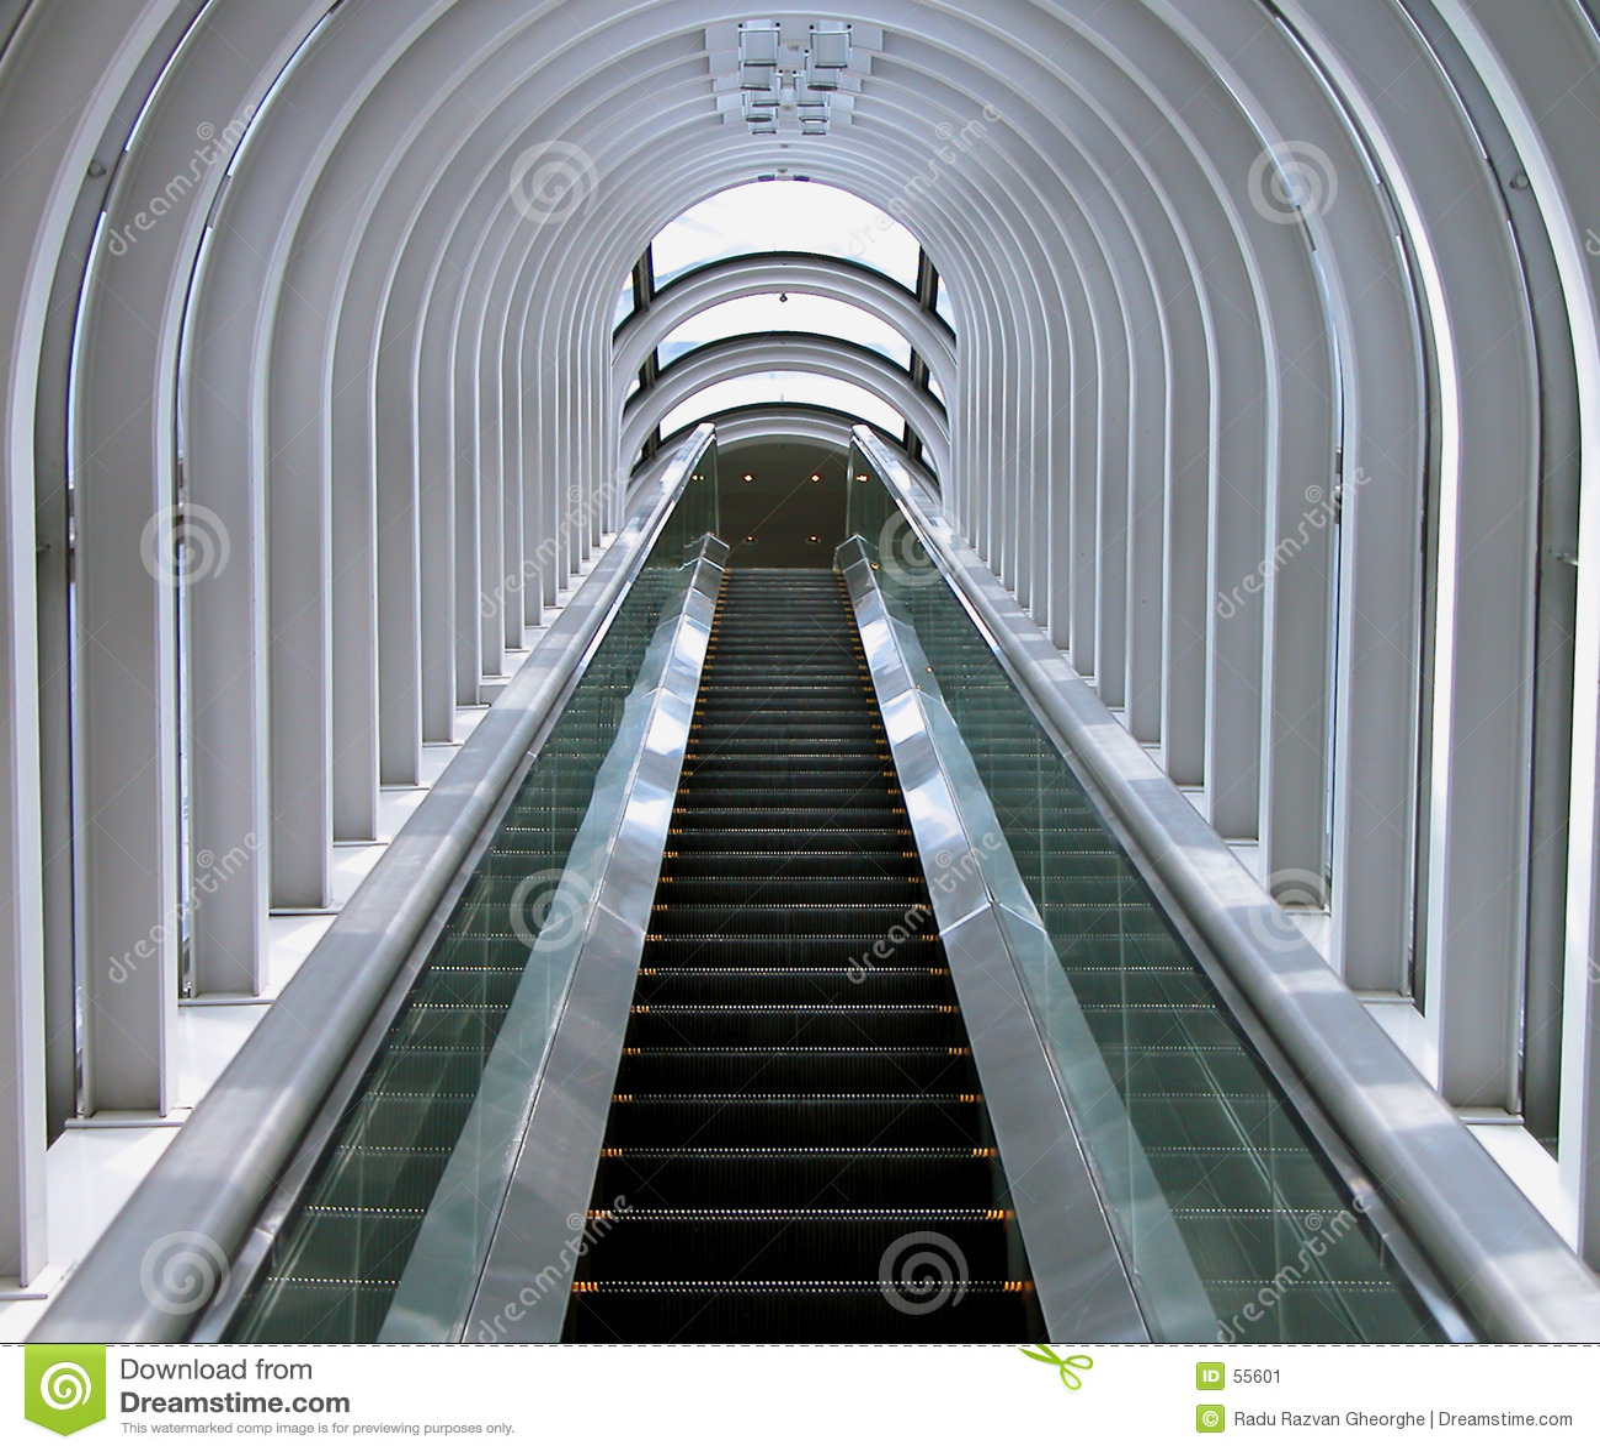 Download Escalier mobile futuriste image stock. Image du escalator - 55601